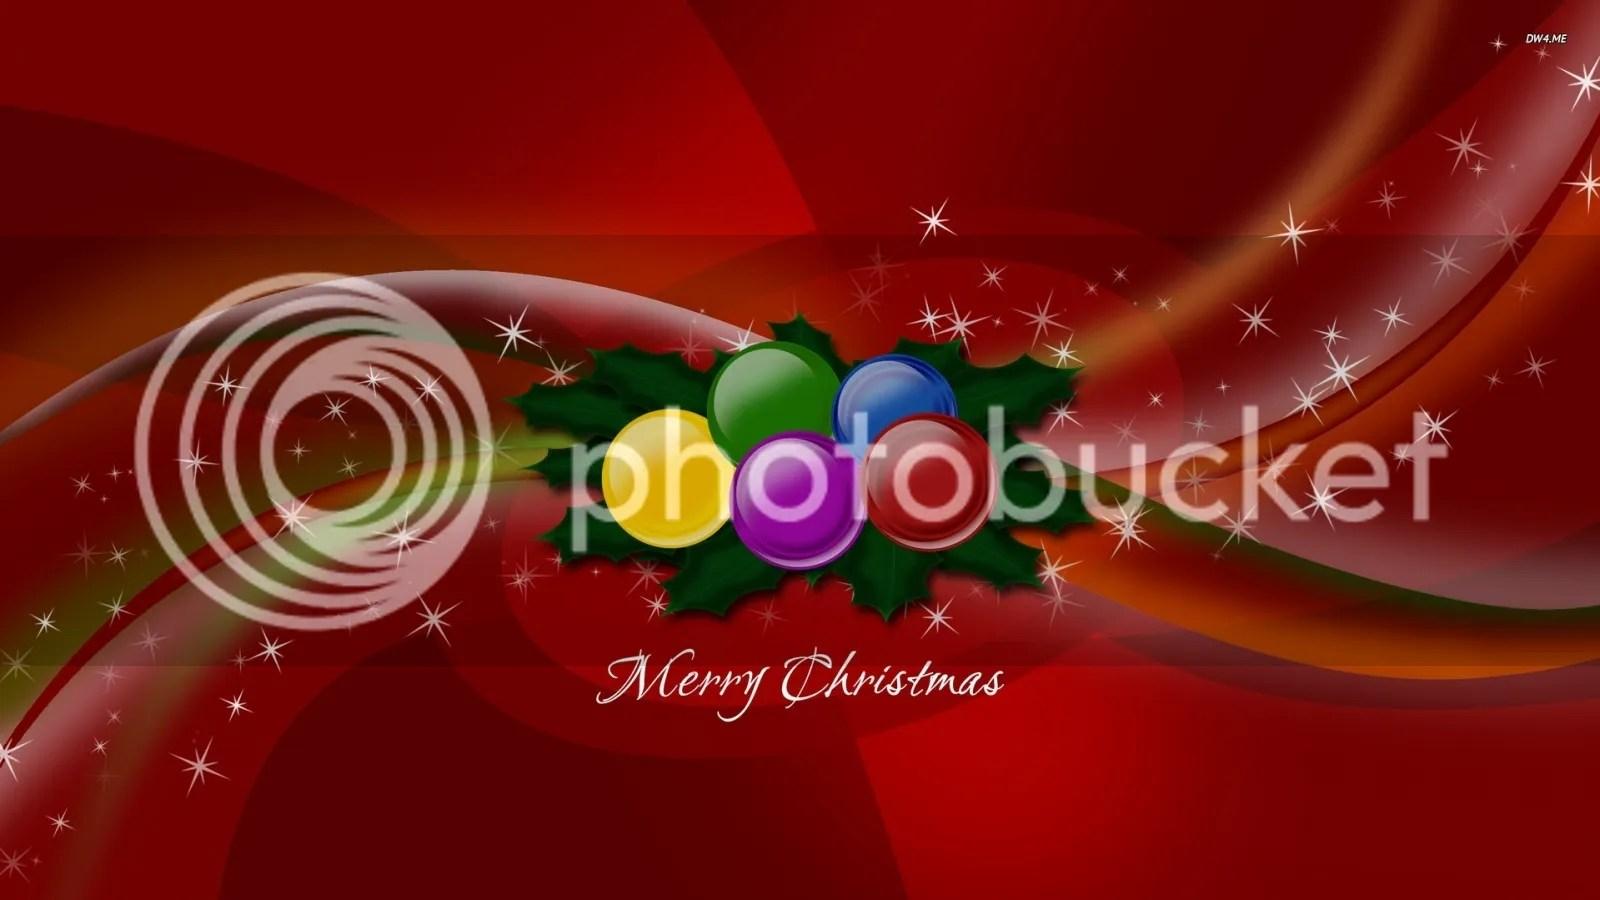 photo Merry Christmas_zpssdsut0ce.jpg